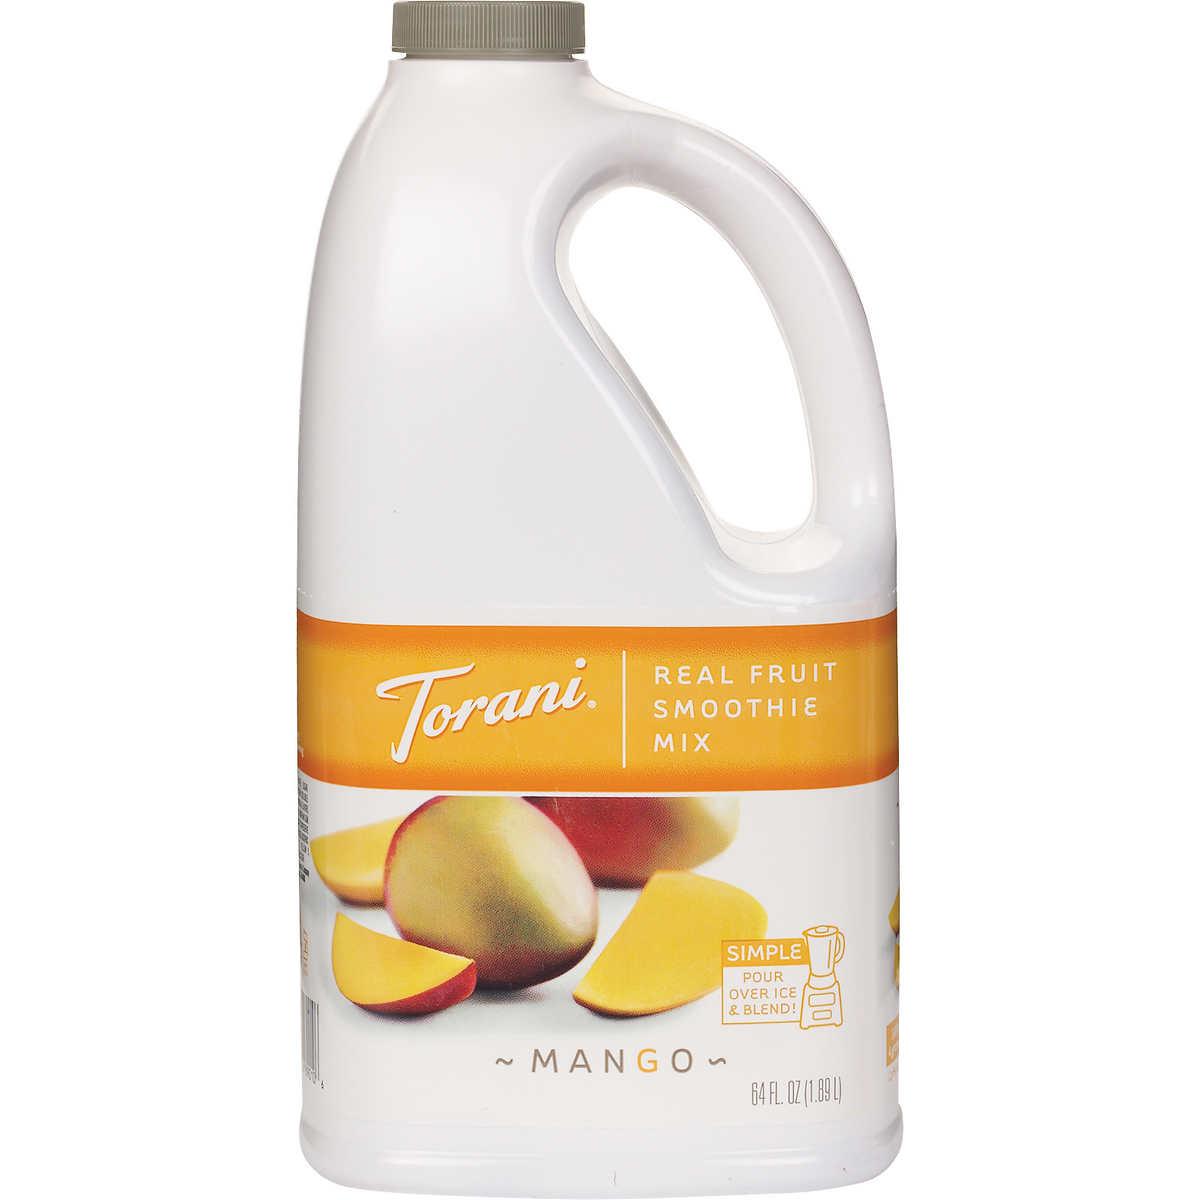 Torani Mango Real Fruit Smoothie Mix